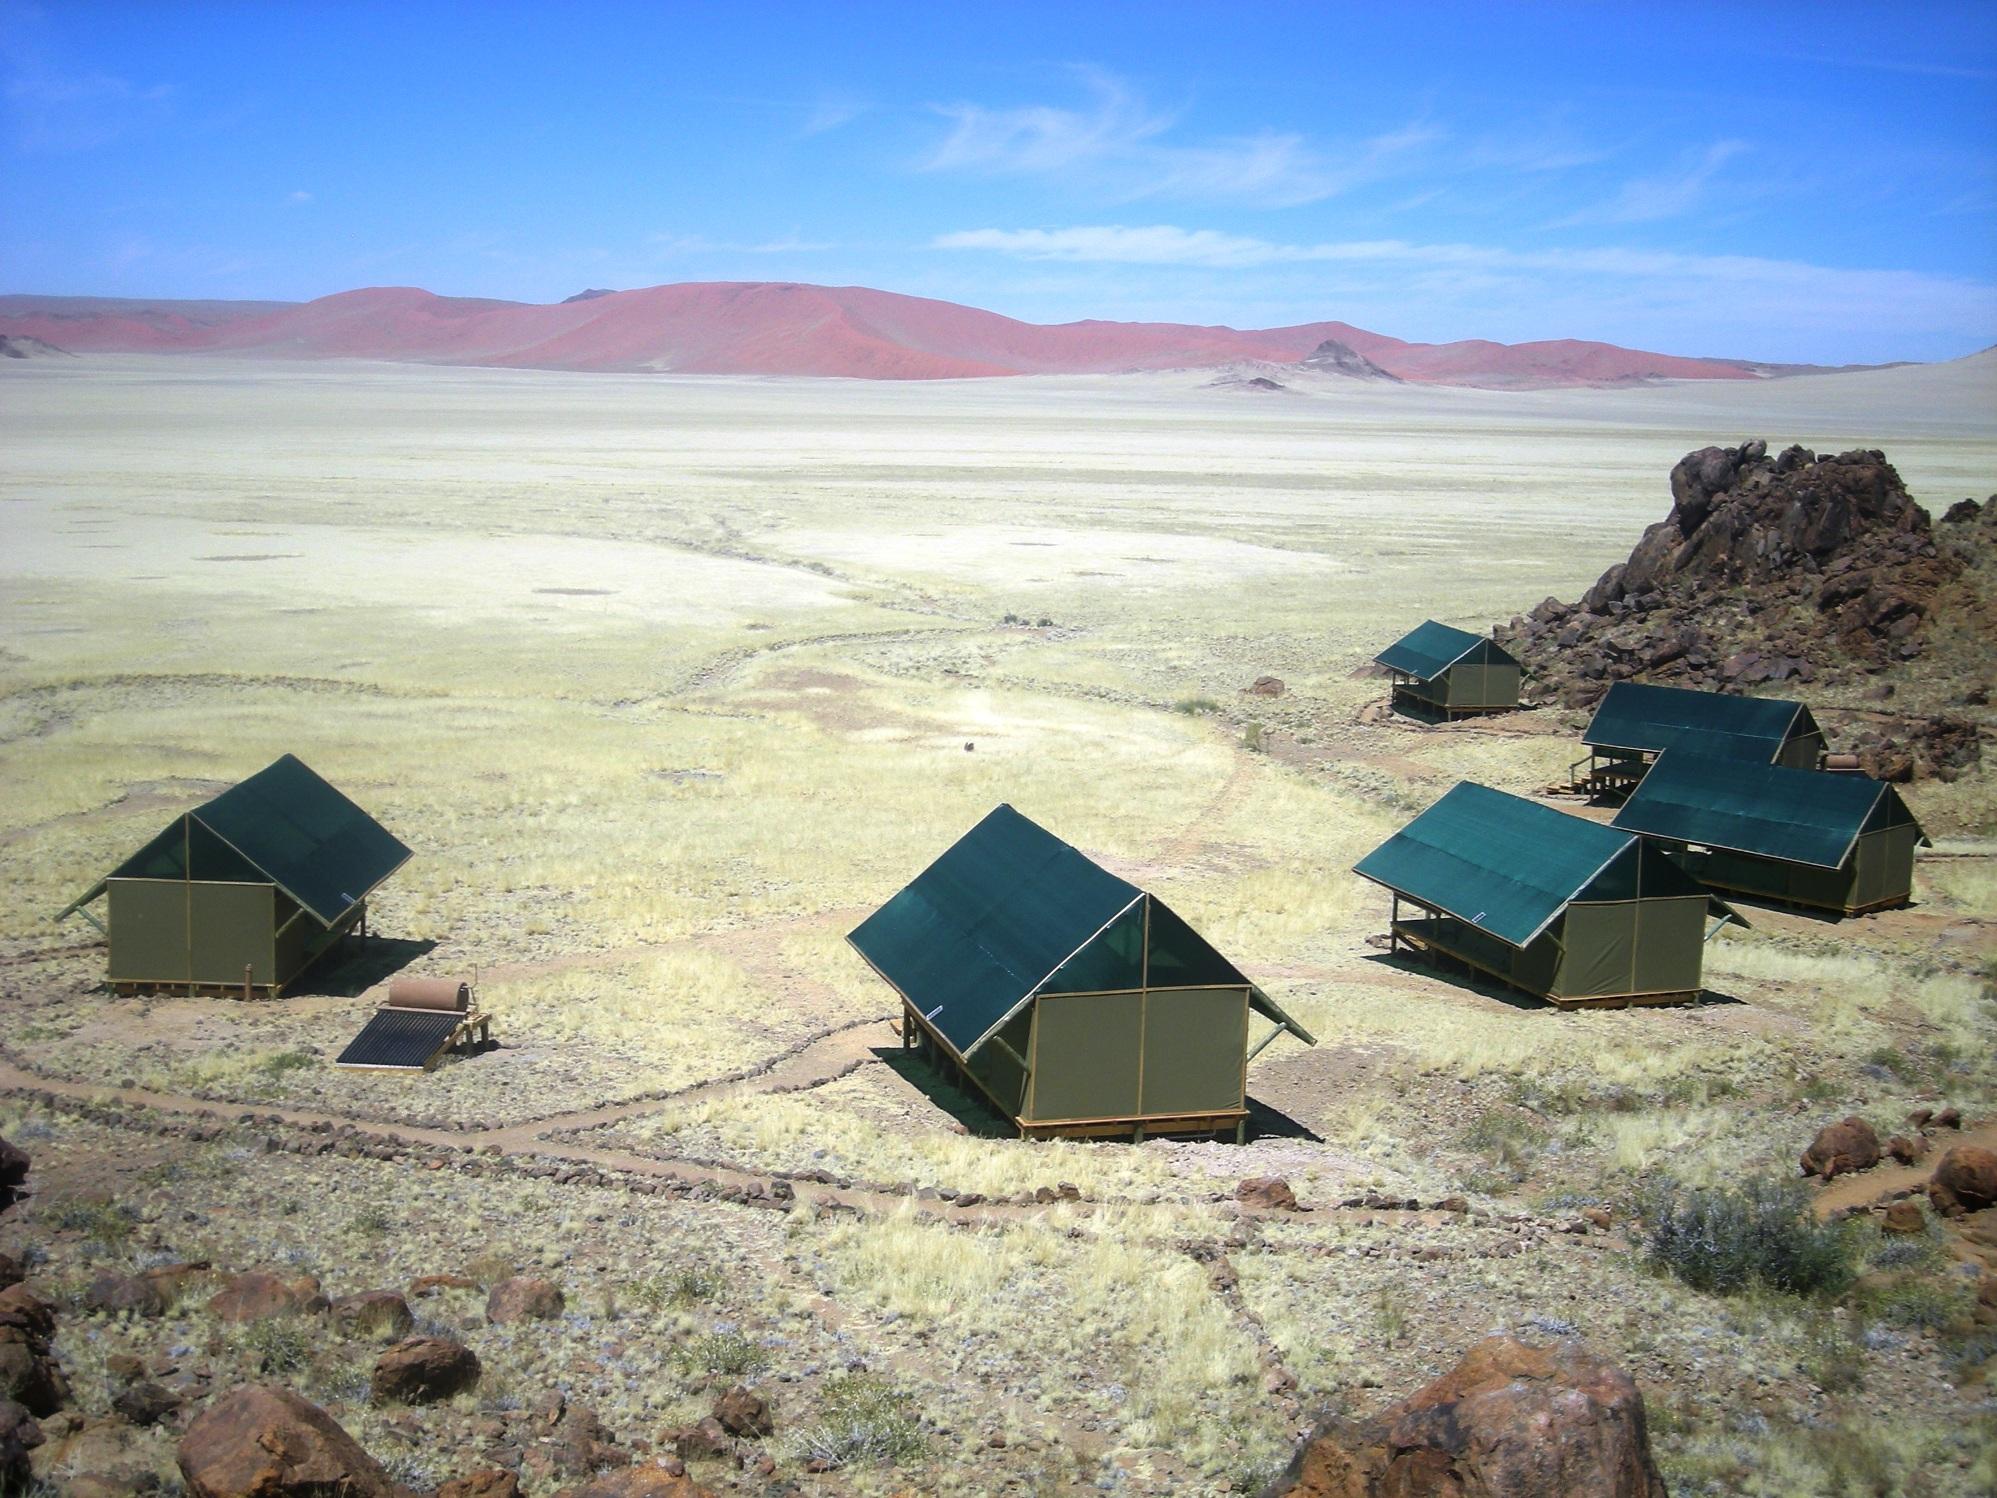 Kulala Adventurer Camp